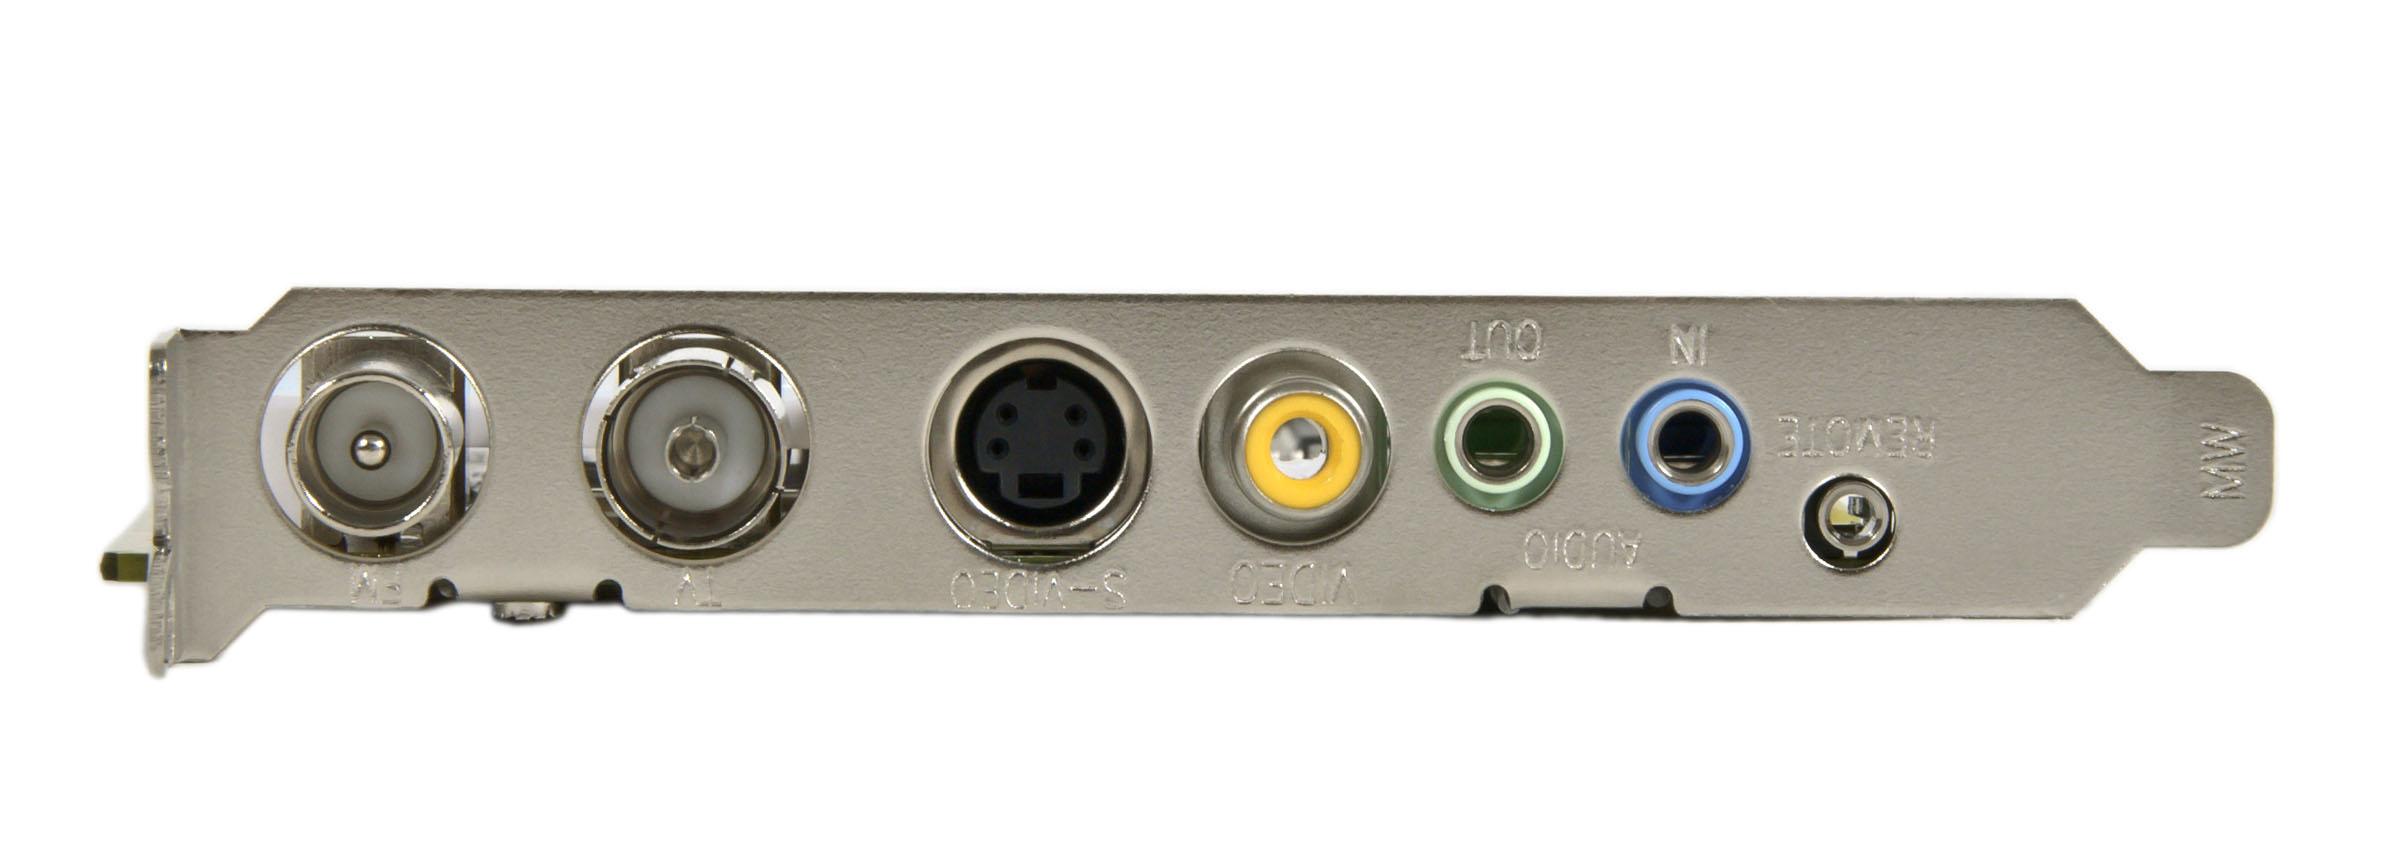 ТВ-тюнеры и платы видеозахвата AVerMedia Technologies AVerTV Studio 707